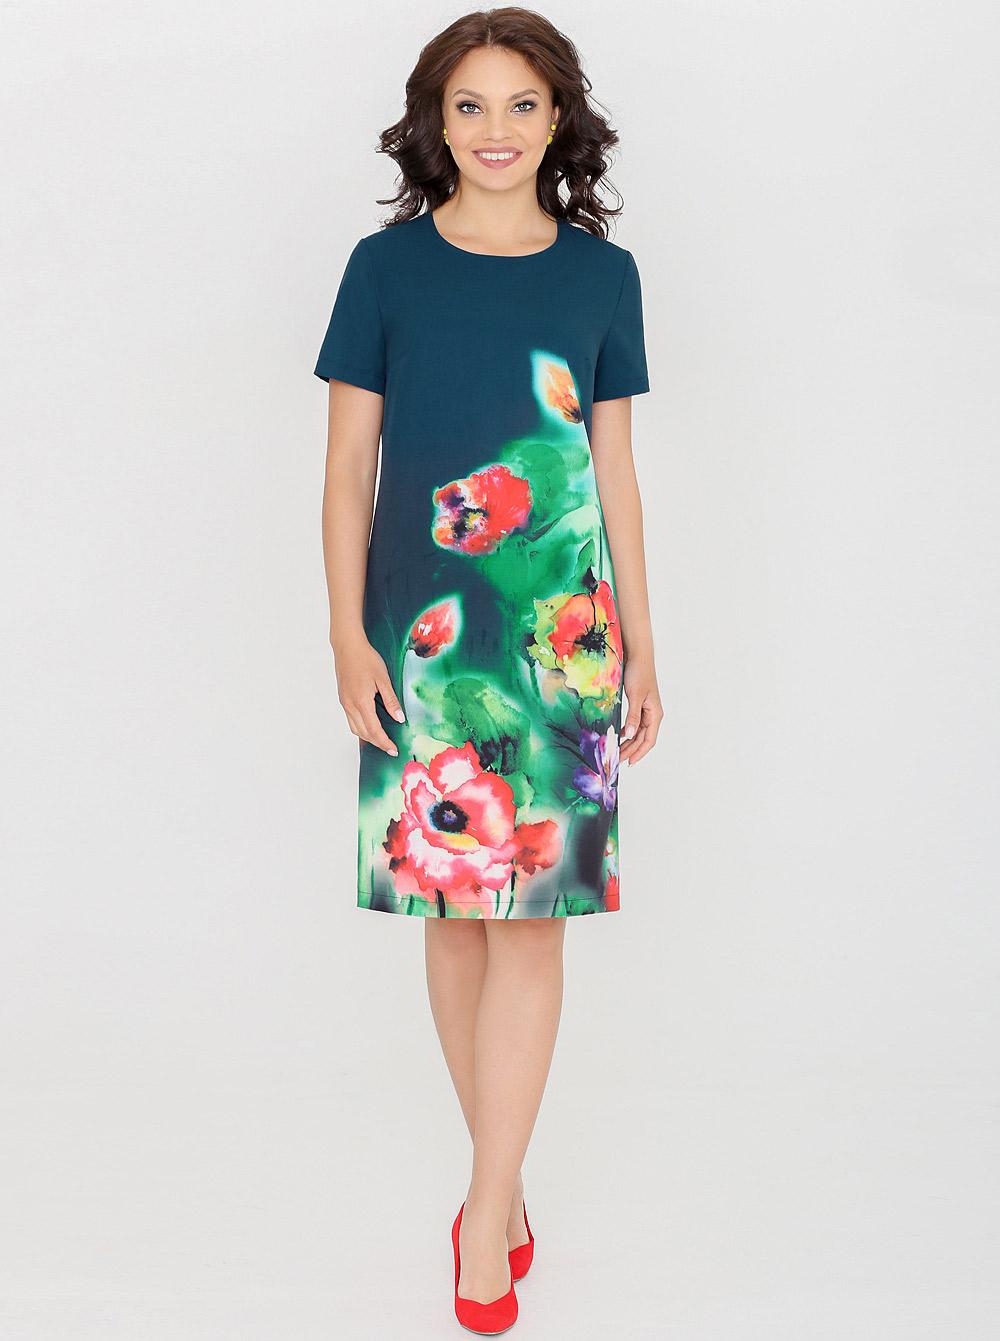 7a6861b4b1e76e1 Купить Платье П-0204 Летний виш-лист модная Dstrend